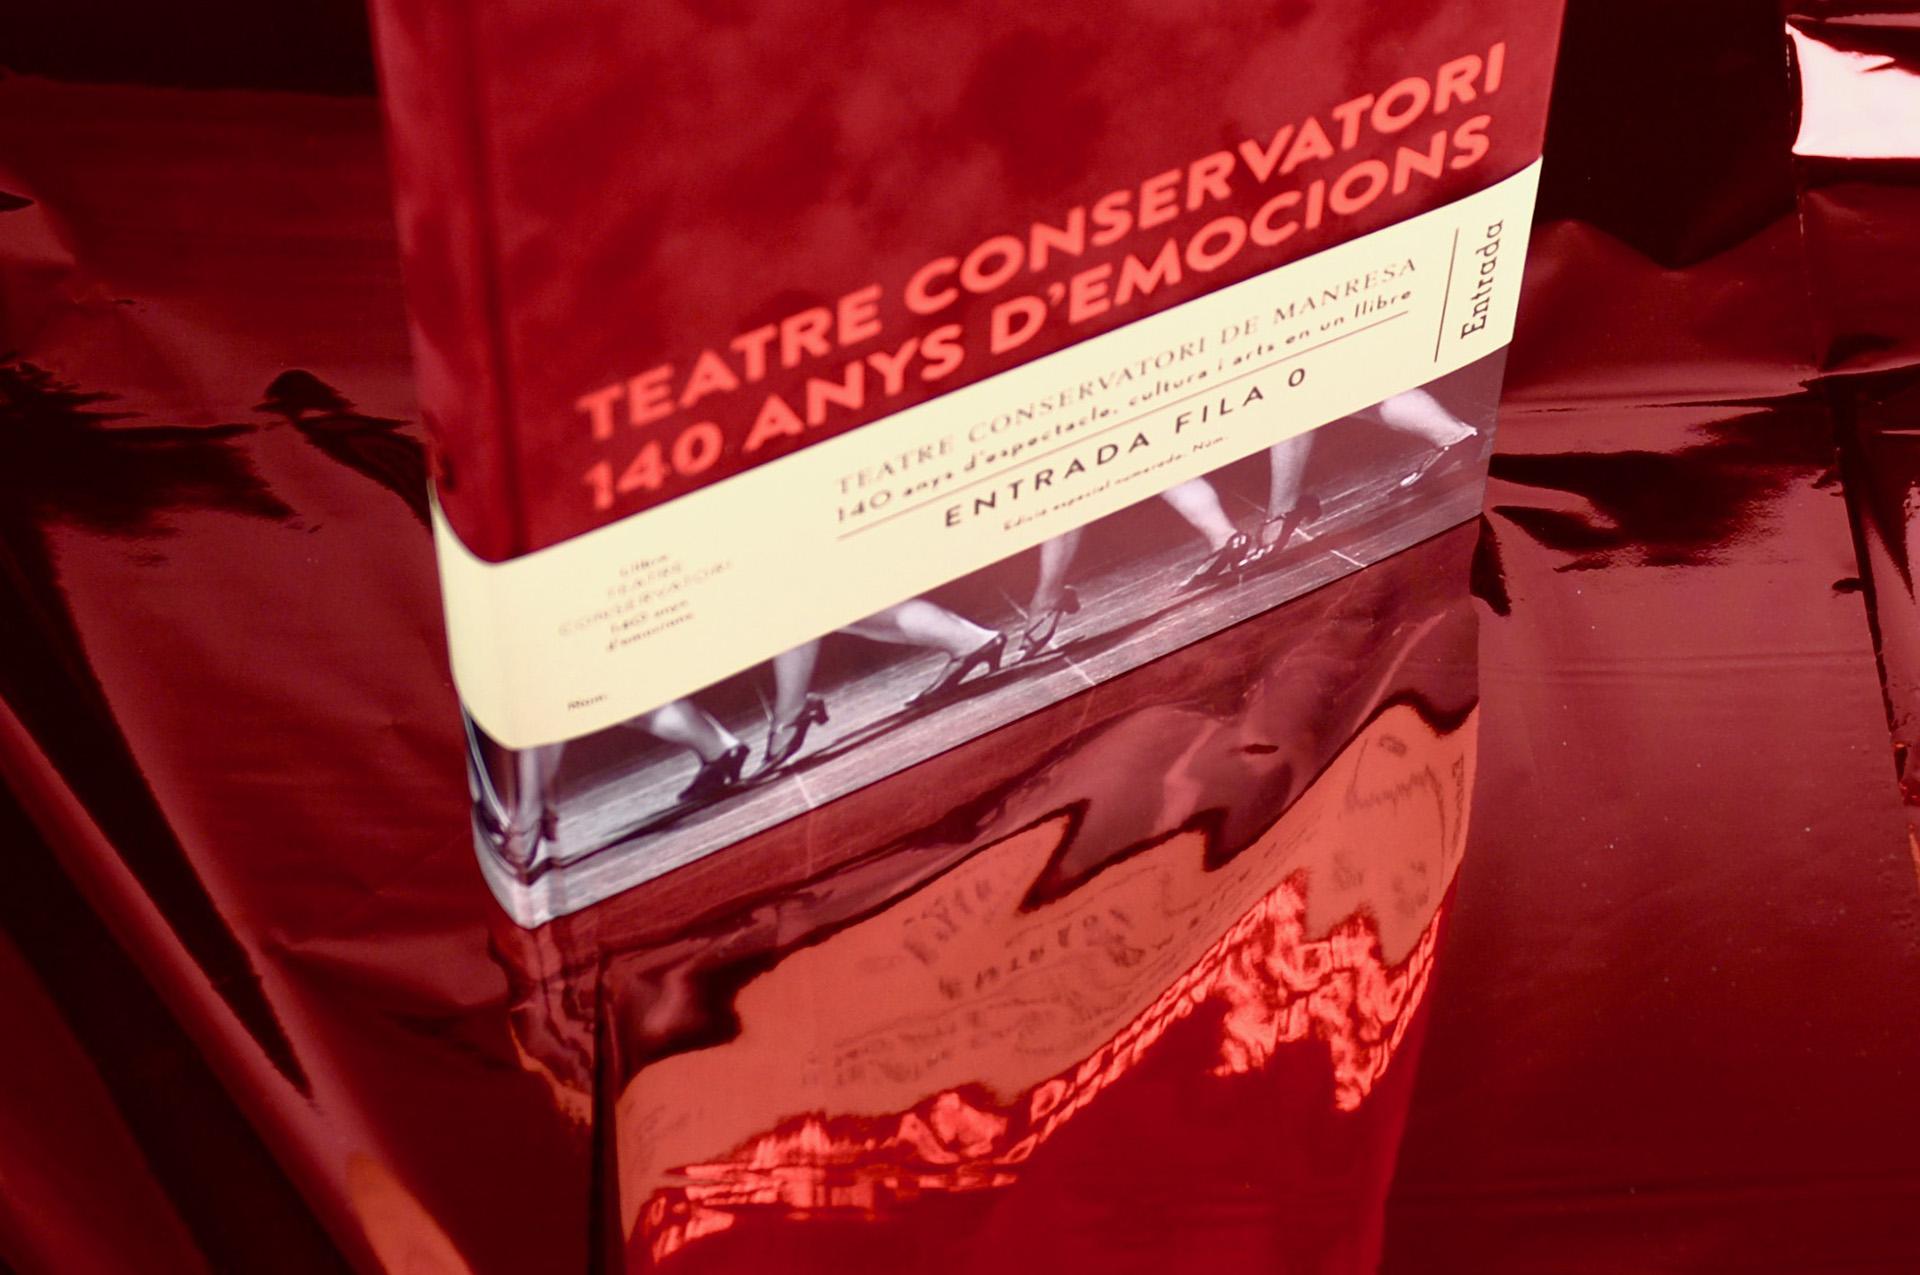 Presentación libro especial Teatre Conservatori Manresa